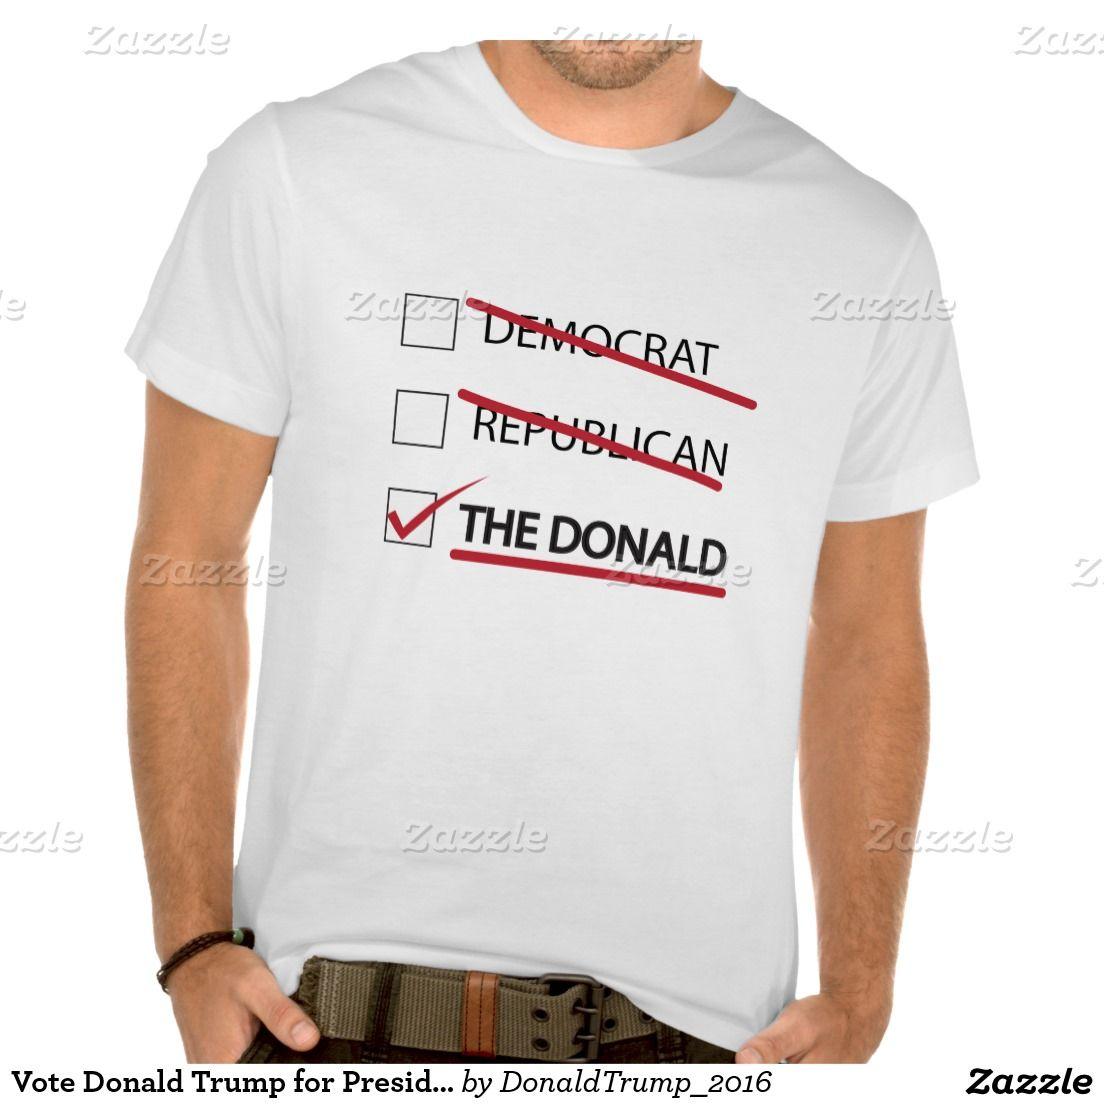 Vote Donald Trump for President Shirt  #Trump #DonaldTrump #Trump2016 #MakeAmericaGreatAgain #politics